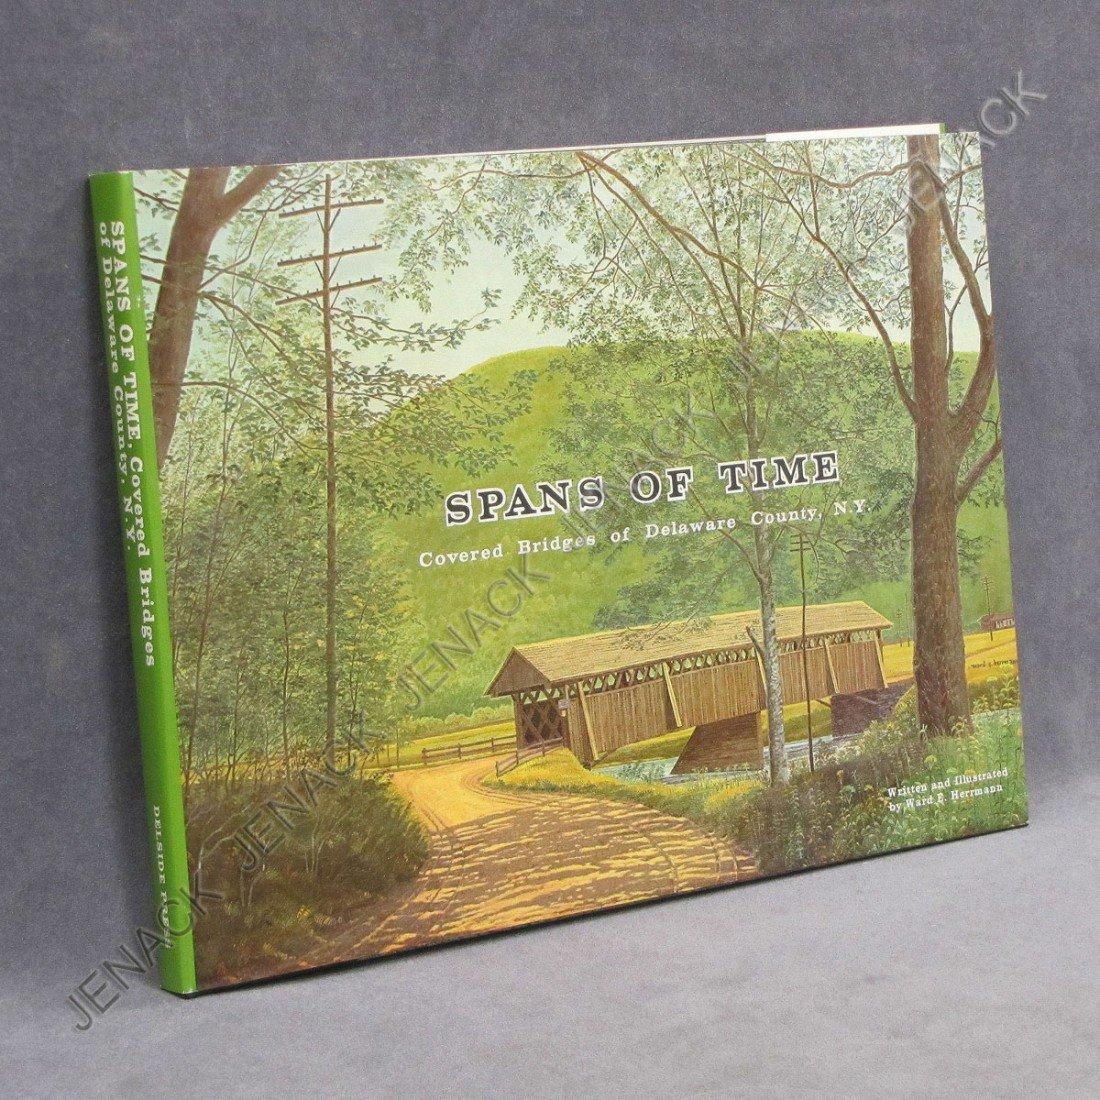 112: VOLUME-SPANS OF TIME: COVERED BRIDGES OF DELAWARE